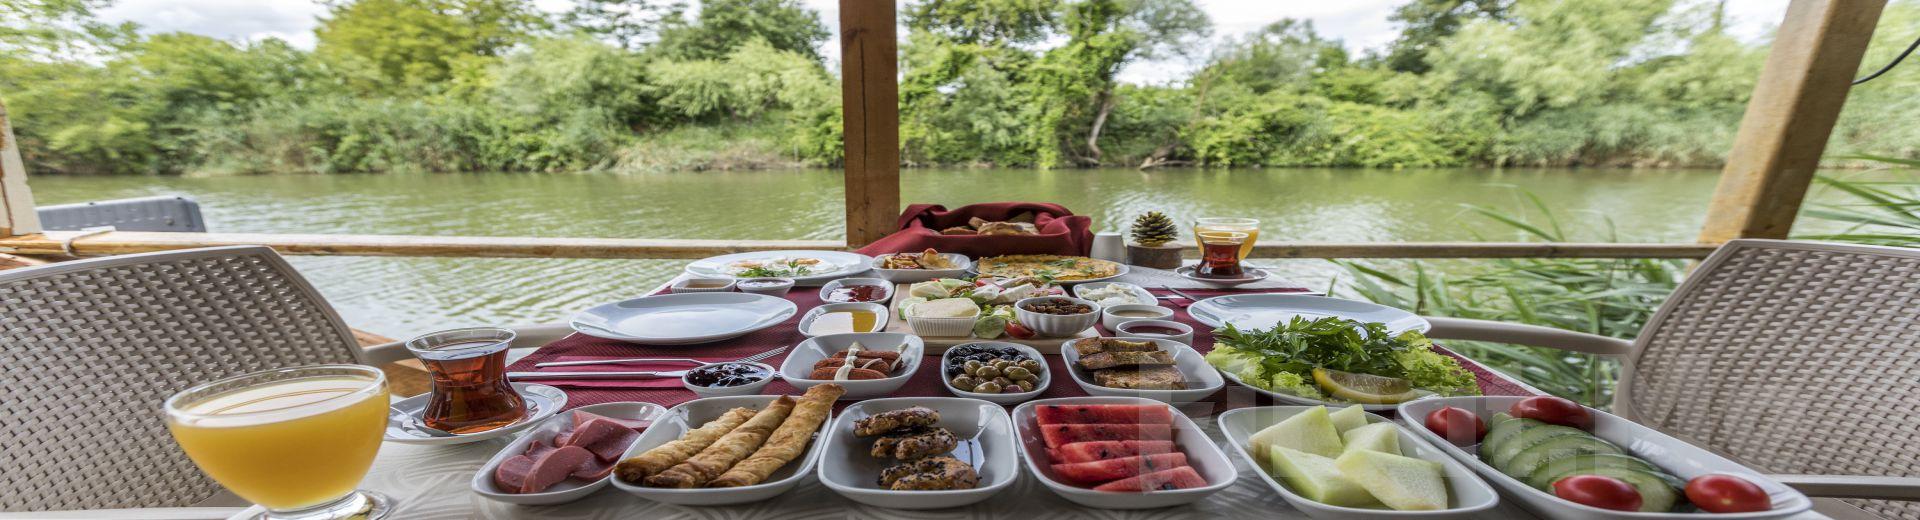 Göksu Nehri Kenarında Ağva El Rio Motel'de Kahvaltı Fırsatı